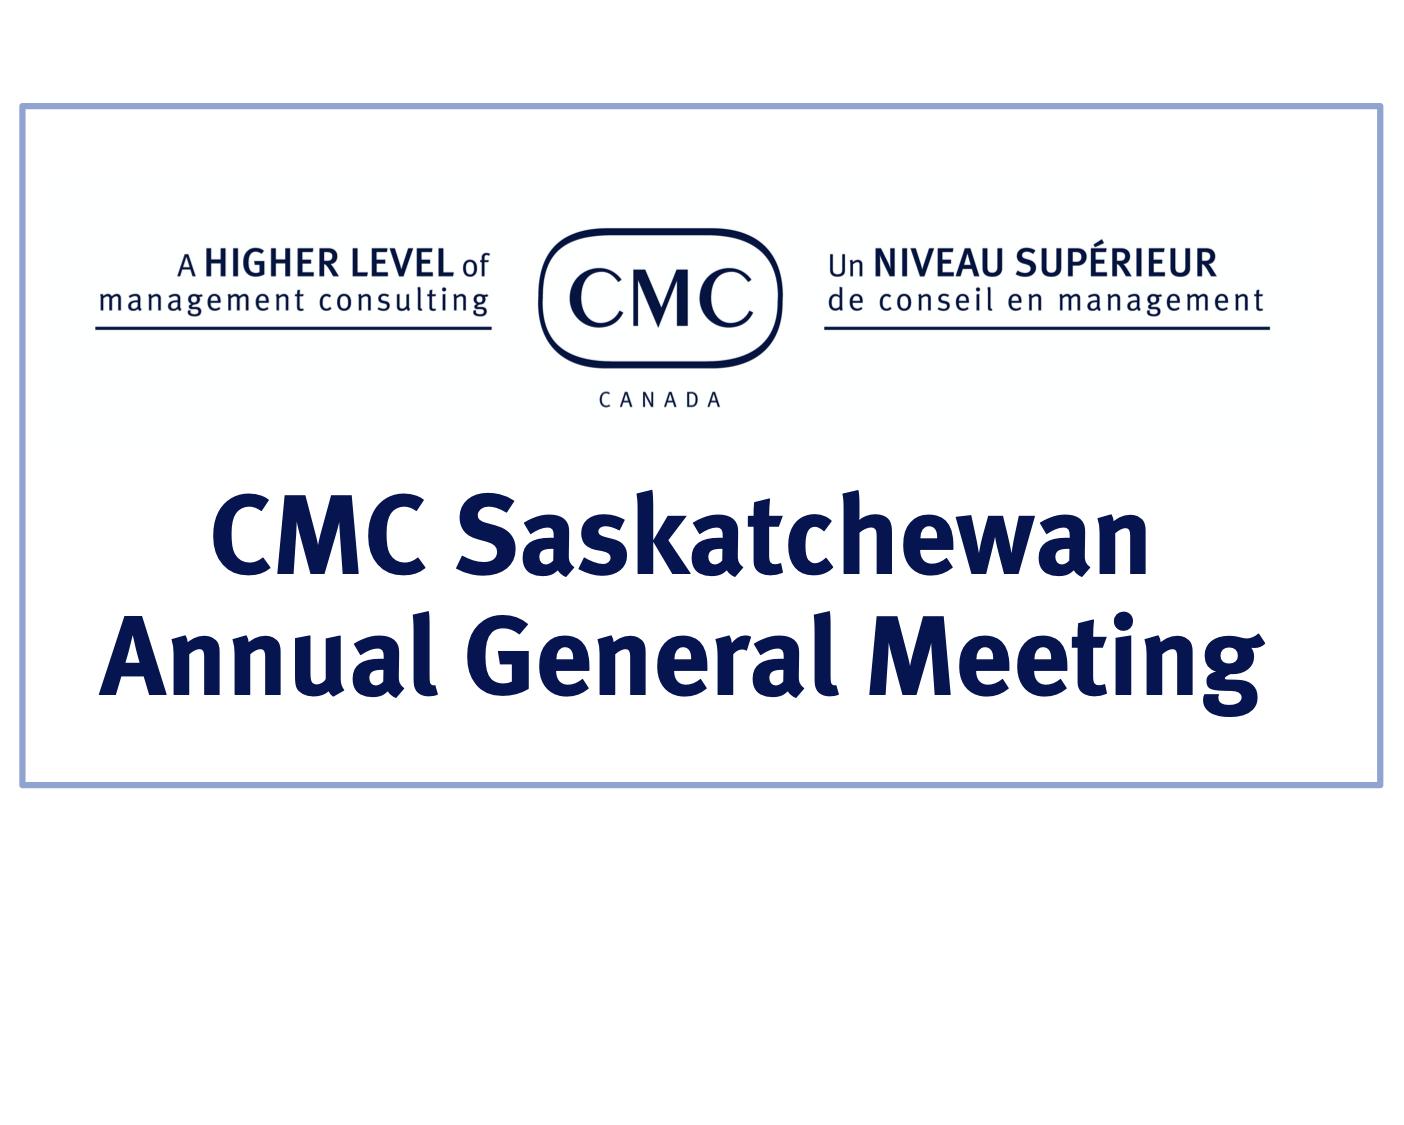 CMC-Saskatchewan Annual General Meeting